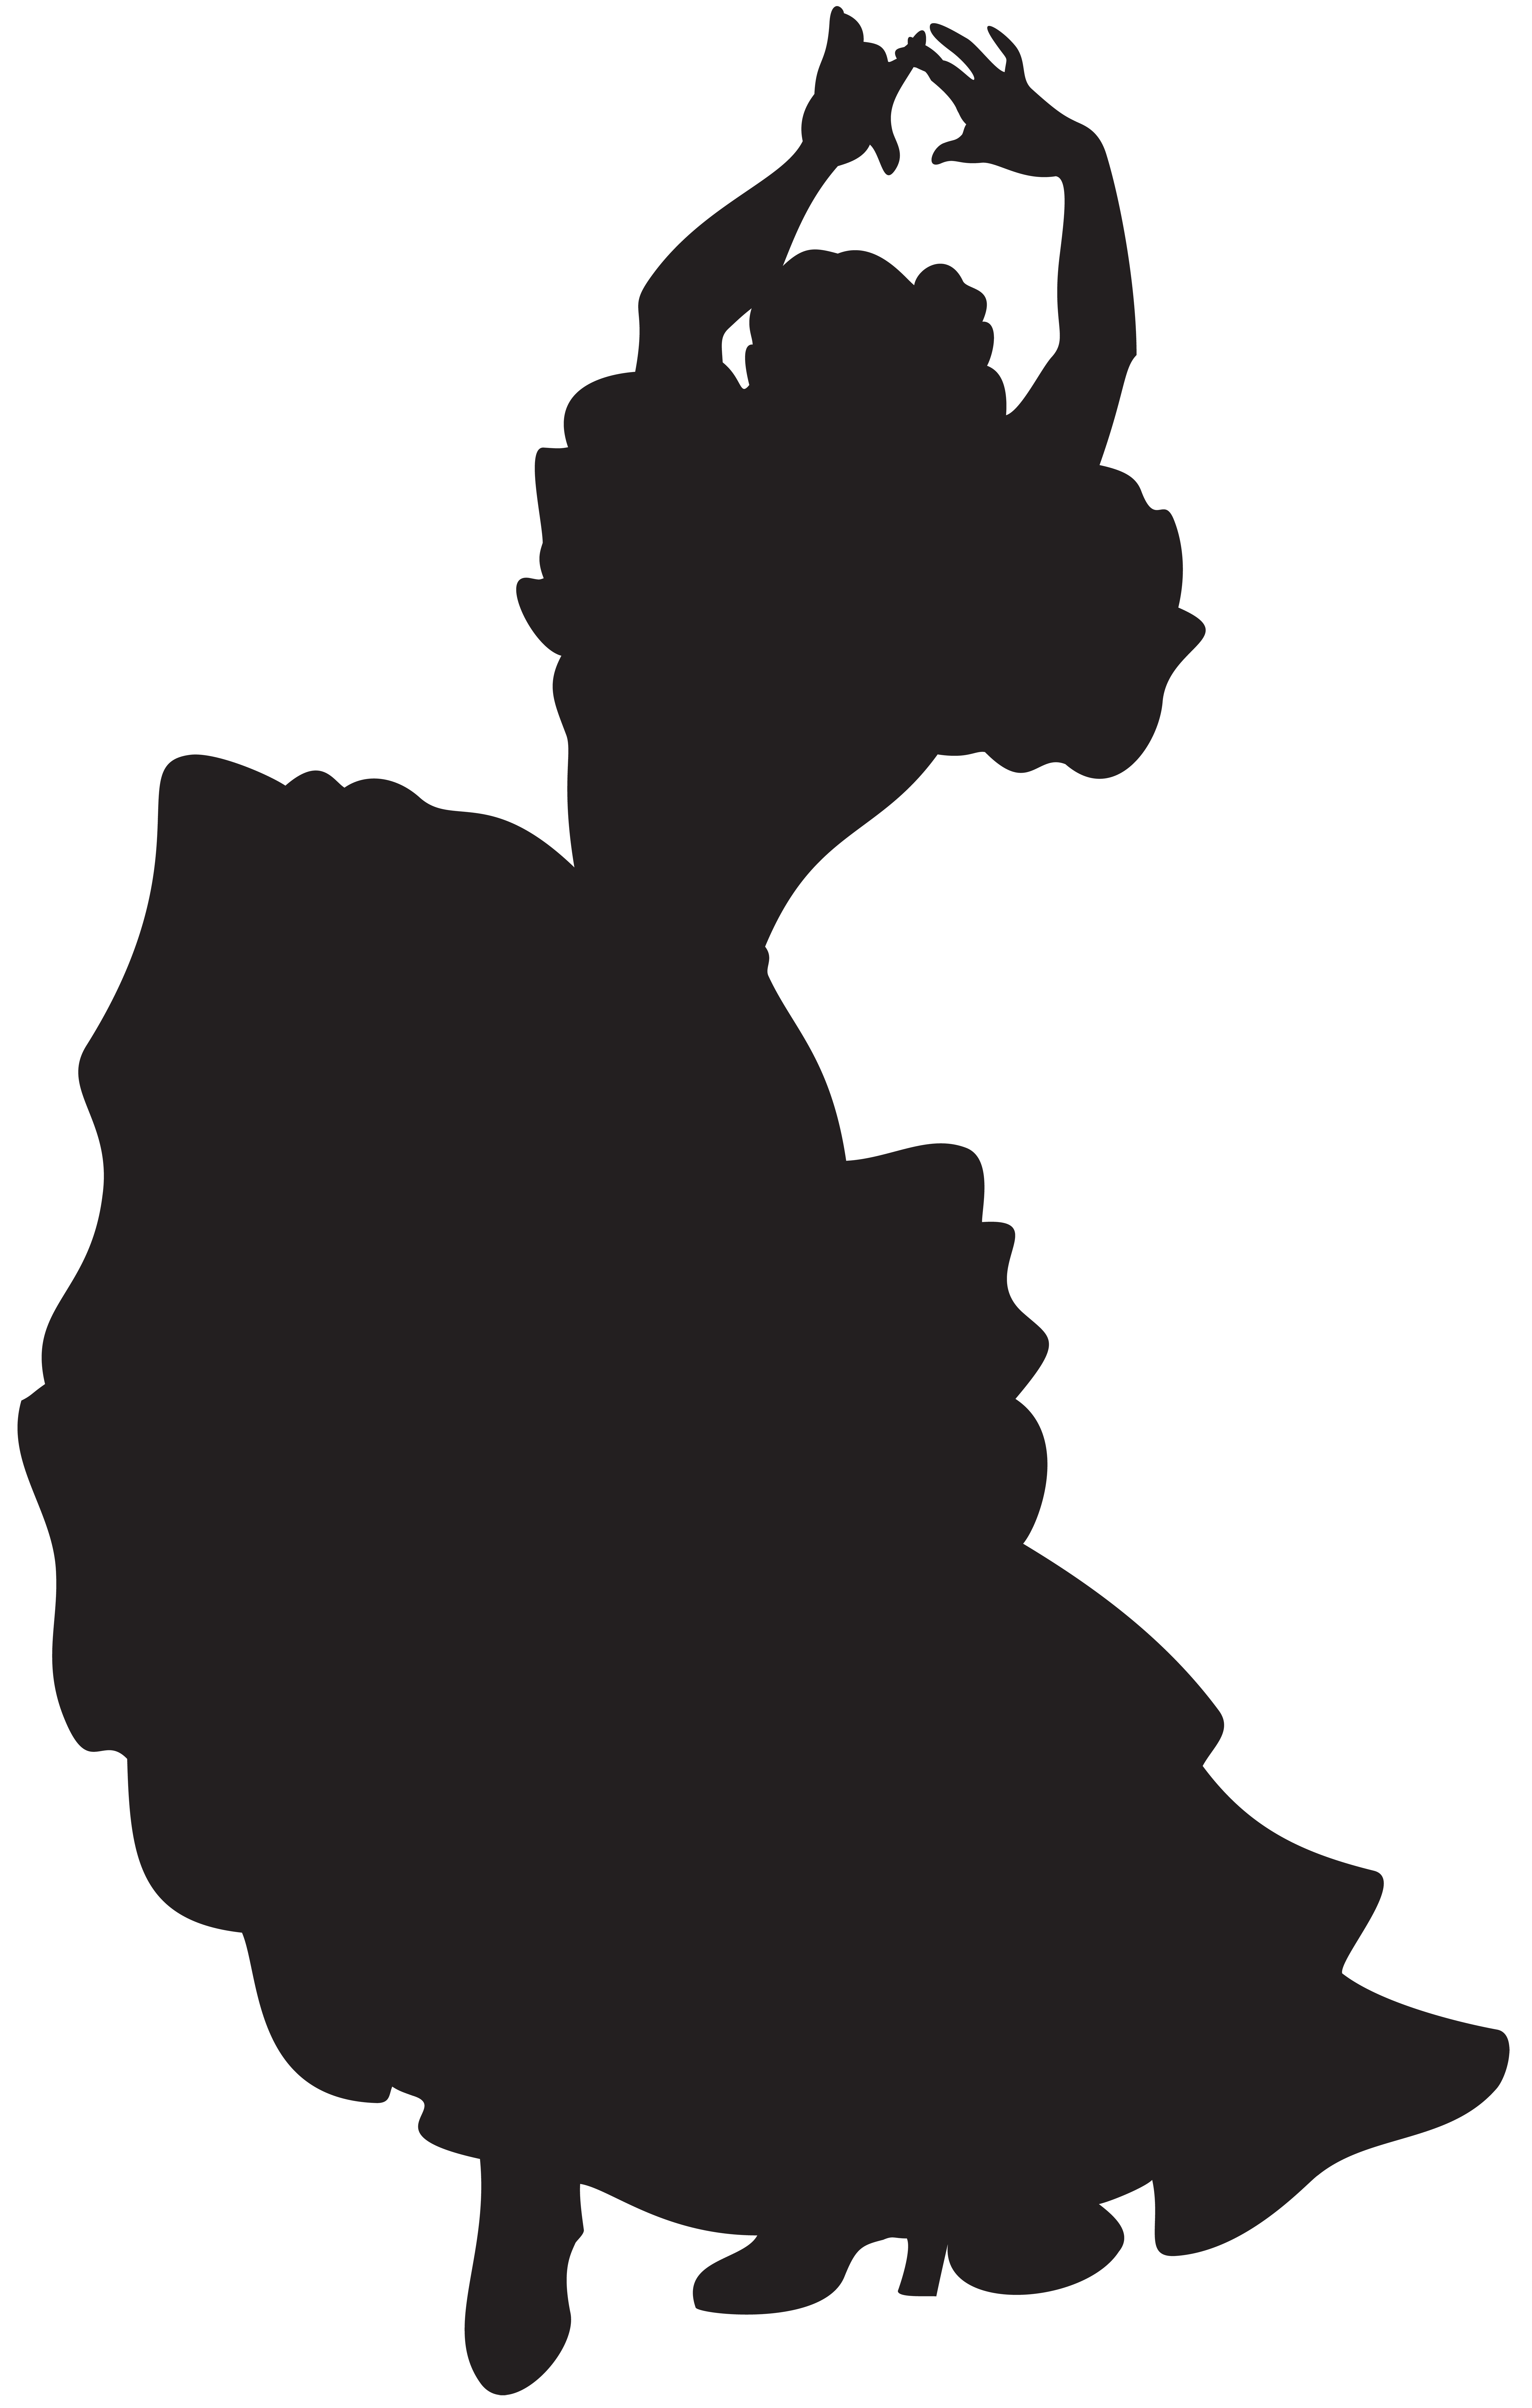 Spanish Dancer Silhouette Clip Art Image.